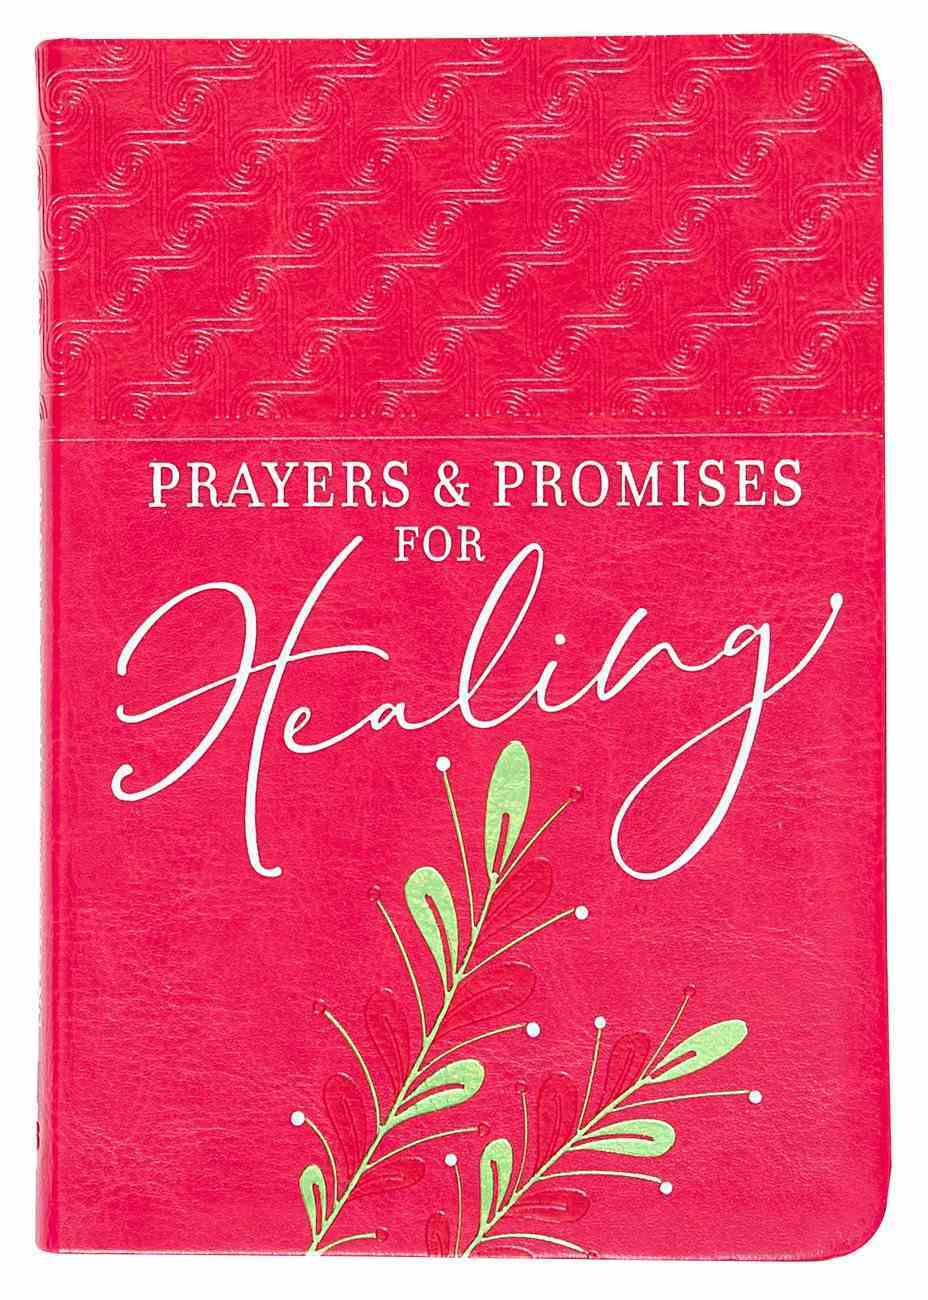 Prayers & Promises For Healing Imitation Leather